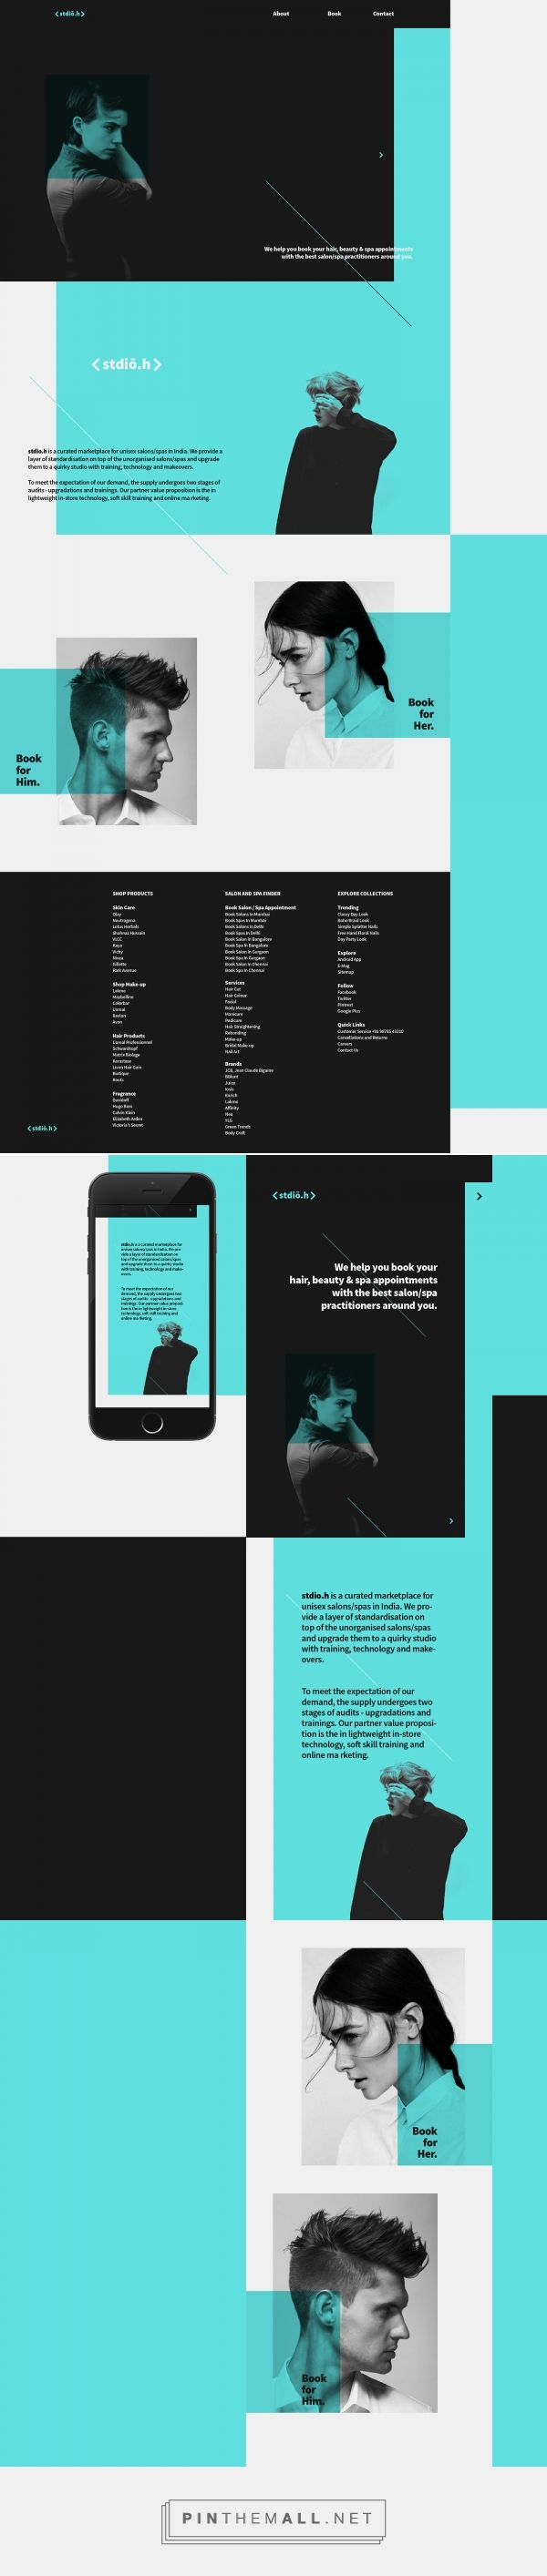 Stdio.h Salon Web Design by Utkarsh Raut   Fivestar Branding Agency – Design and Branding Agency & Curated Inspiration Gallery